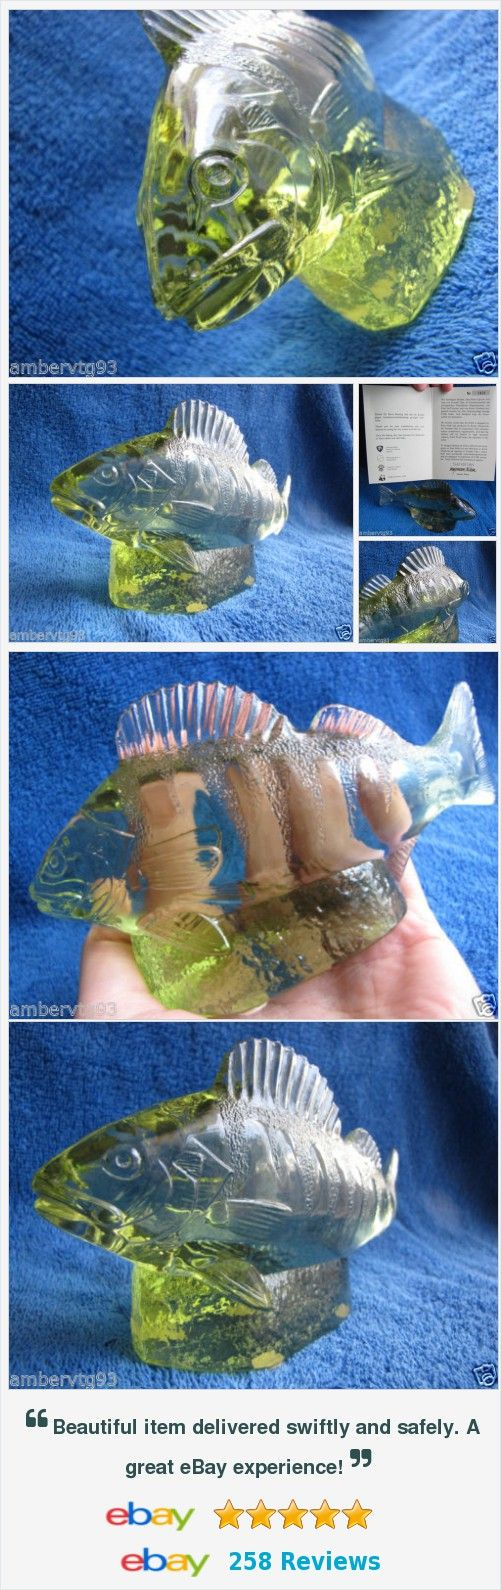 "#Sweden #Kosta Paul #Hoff #glass abborre #perch #figurine #skulpture #WWF #animals #fish #Scandinavian #antique #vintage #collectible items "" Kosta #Boda WWF animals #Figurines , #Vases , #Candle holders , #Orrefors , #Bergdala , #Reijmyre , and other scandinavian syle #pottery http://www.ebay.com/itm/-/112000276094?"